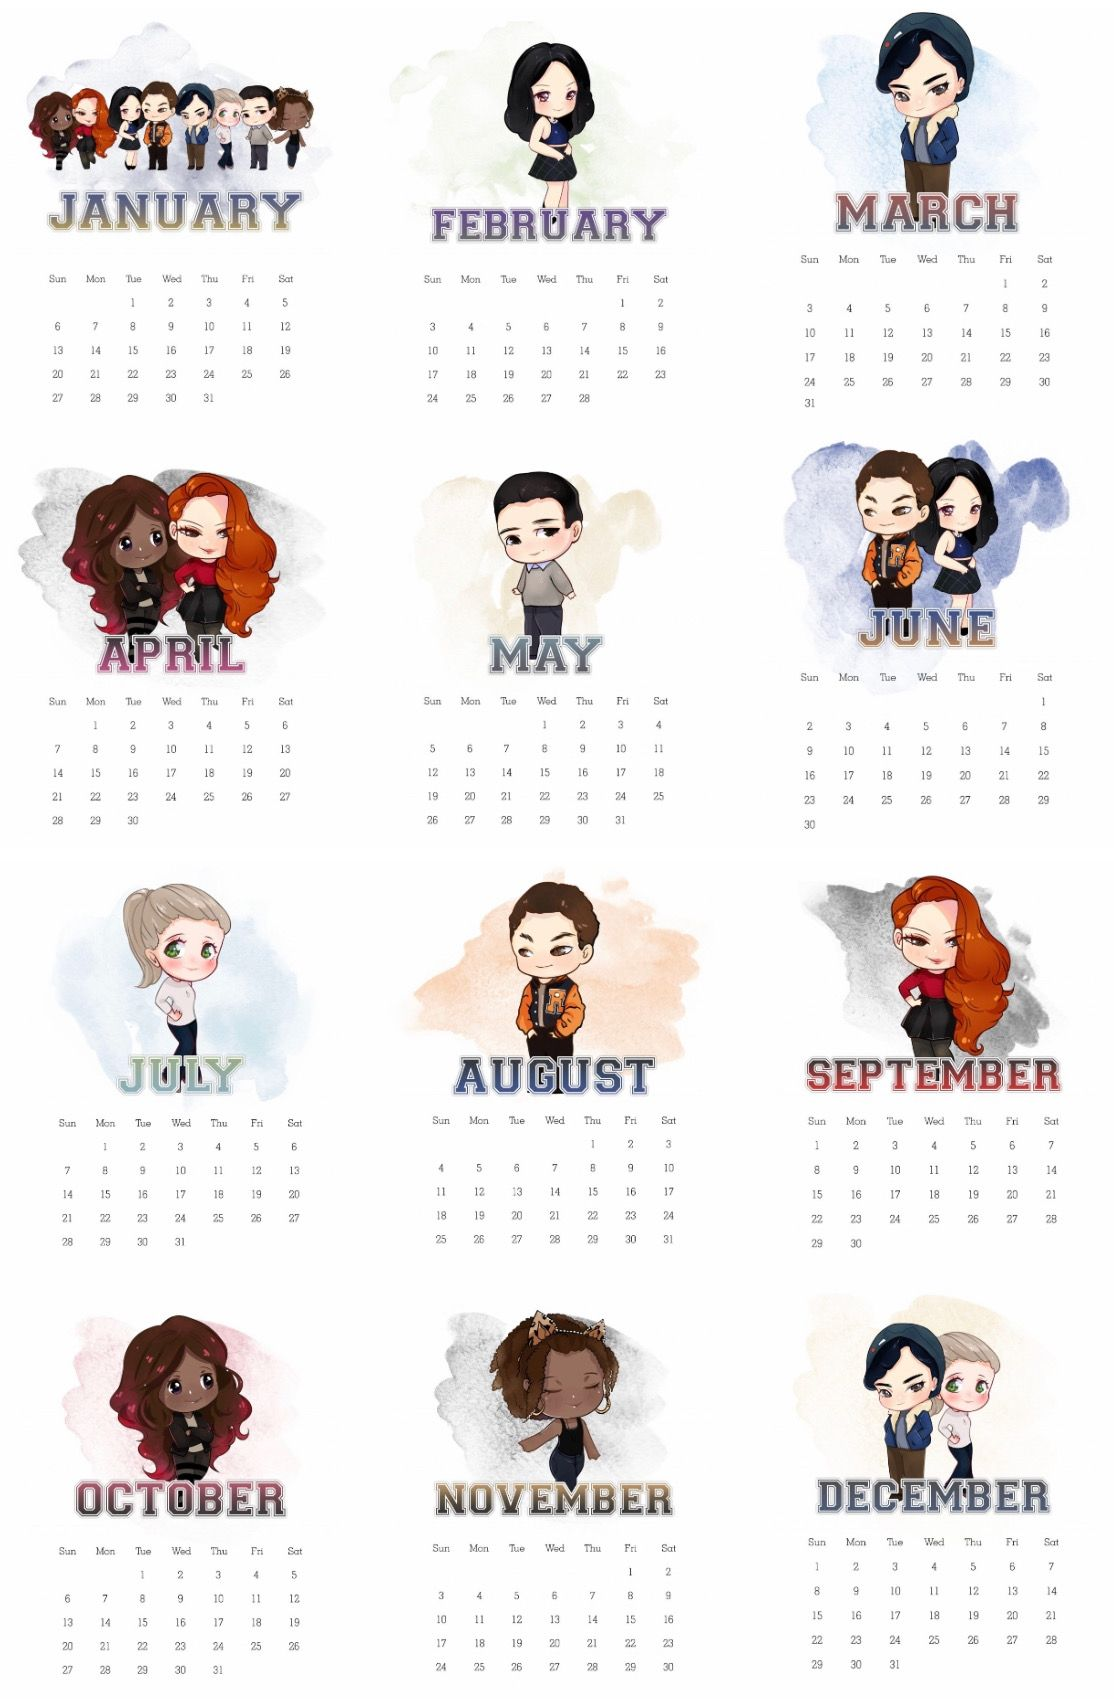 calendário riverdale 2019   Riverdale divertente, Sfondi carini